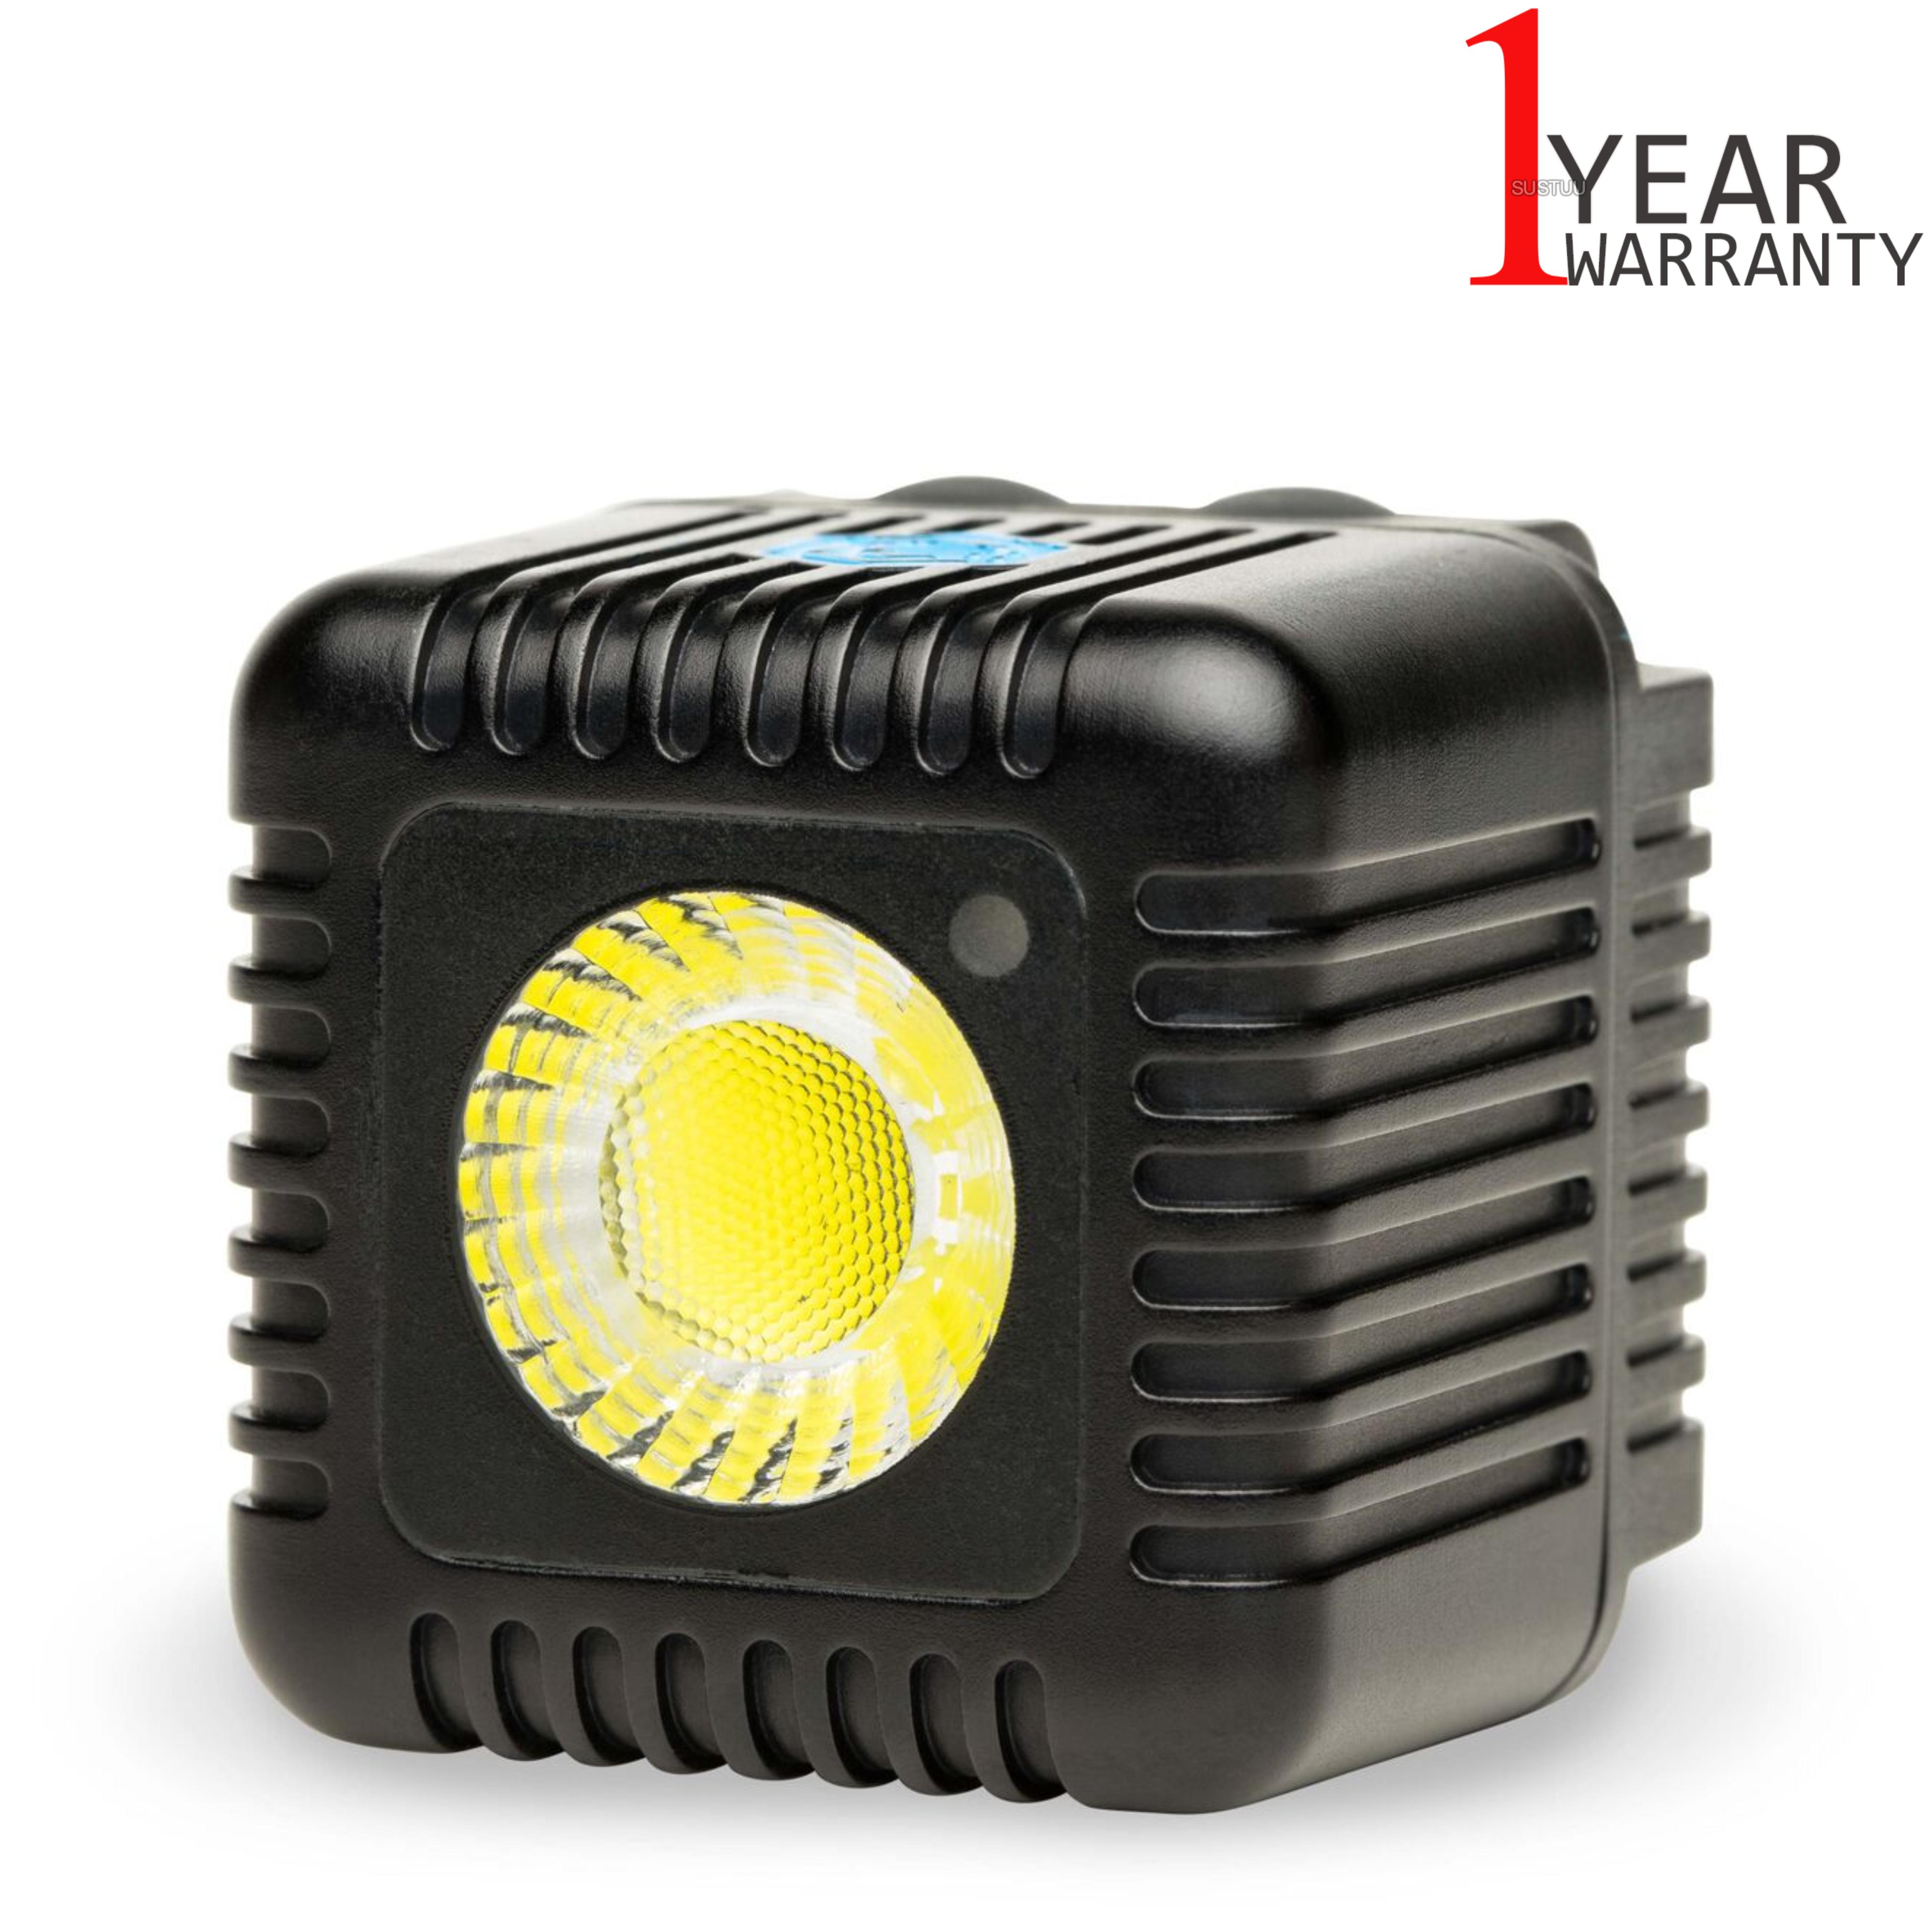 Lume Cube LC11B Single Mini Portable LED Action Light | Bluetooth Controlled | Black